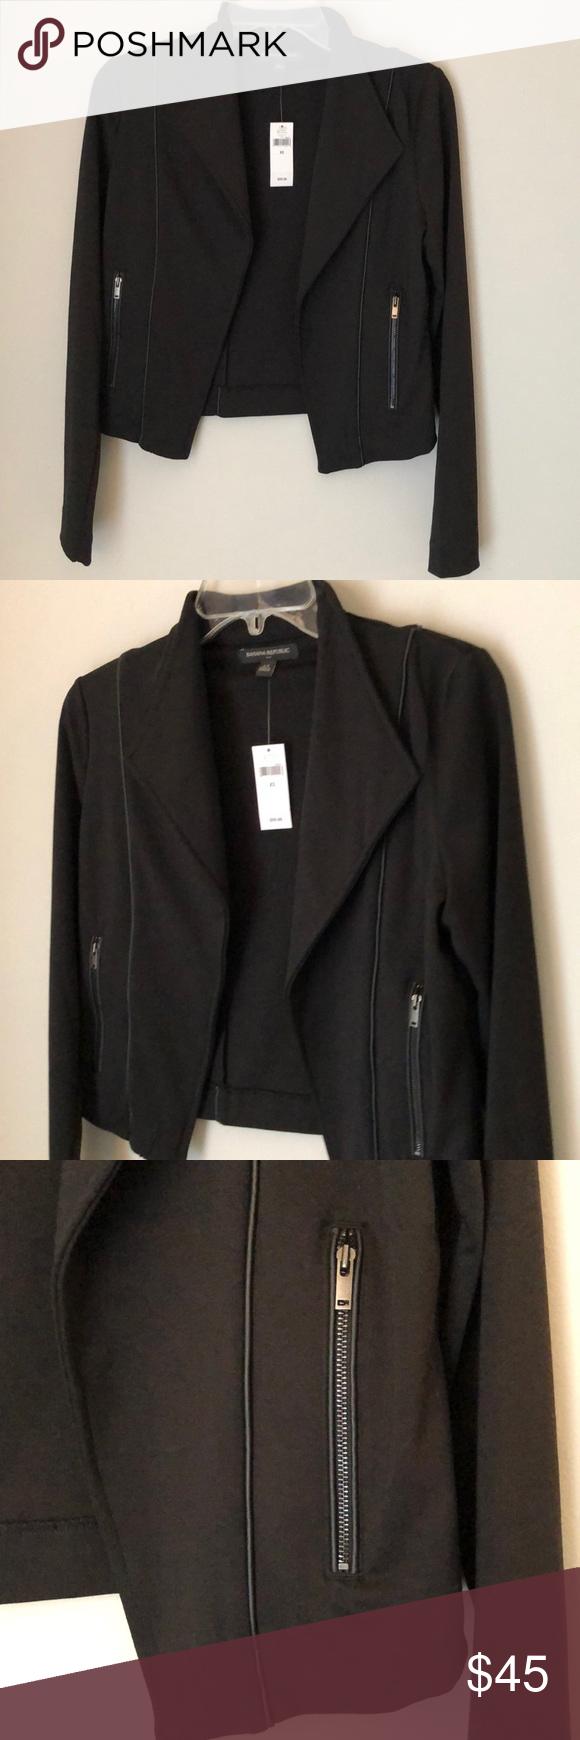 NWT Banana Republic black moto jacket size XS Black moto